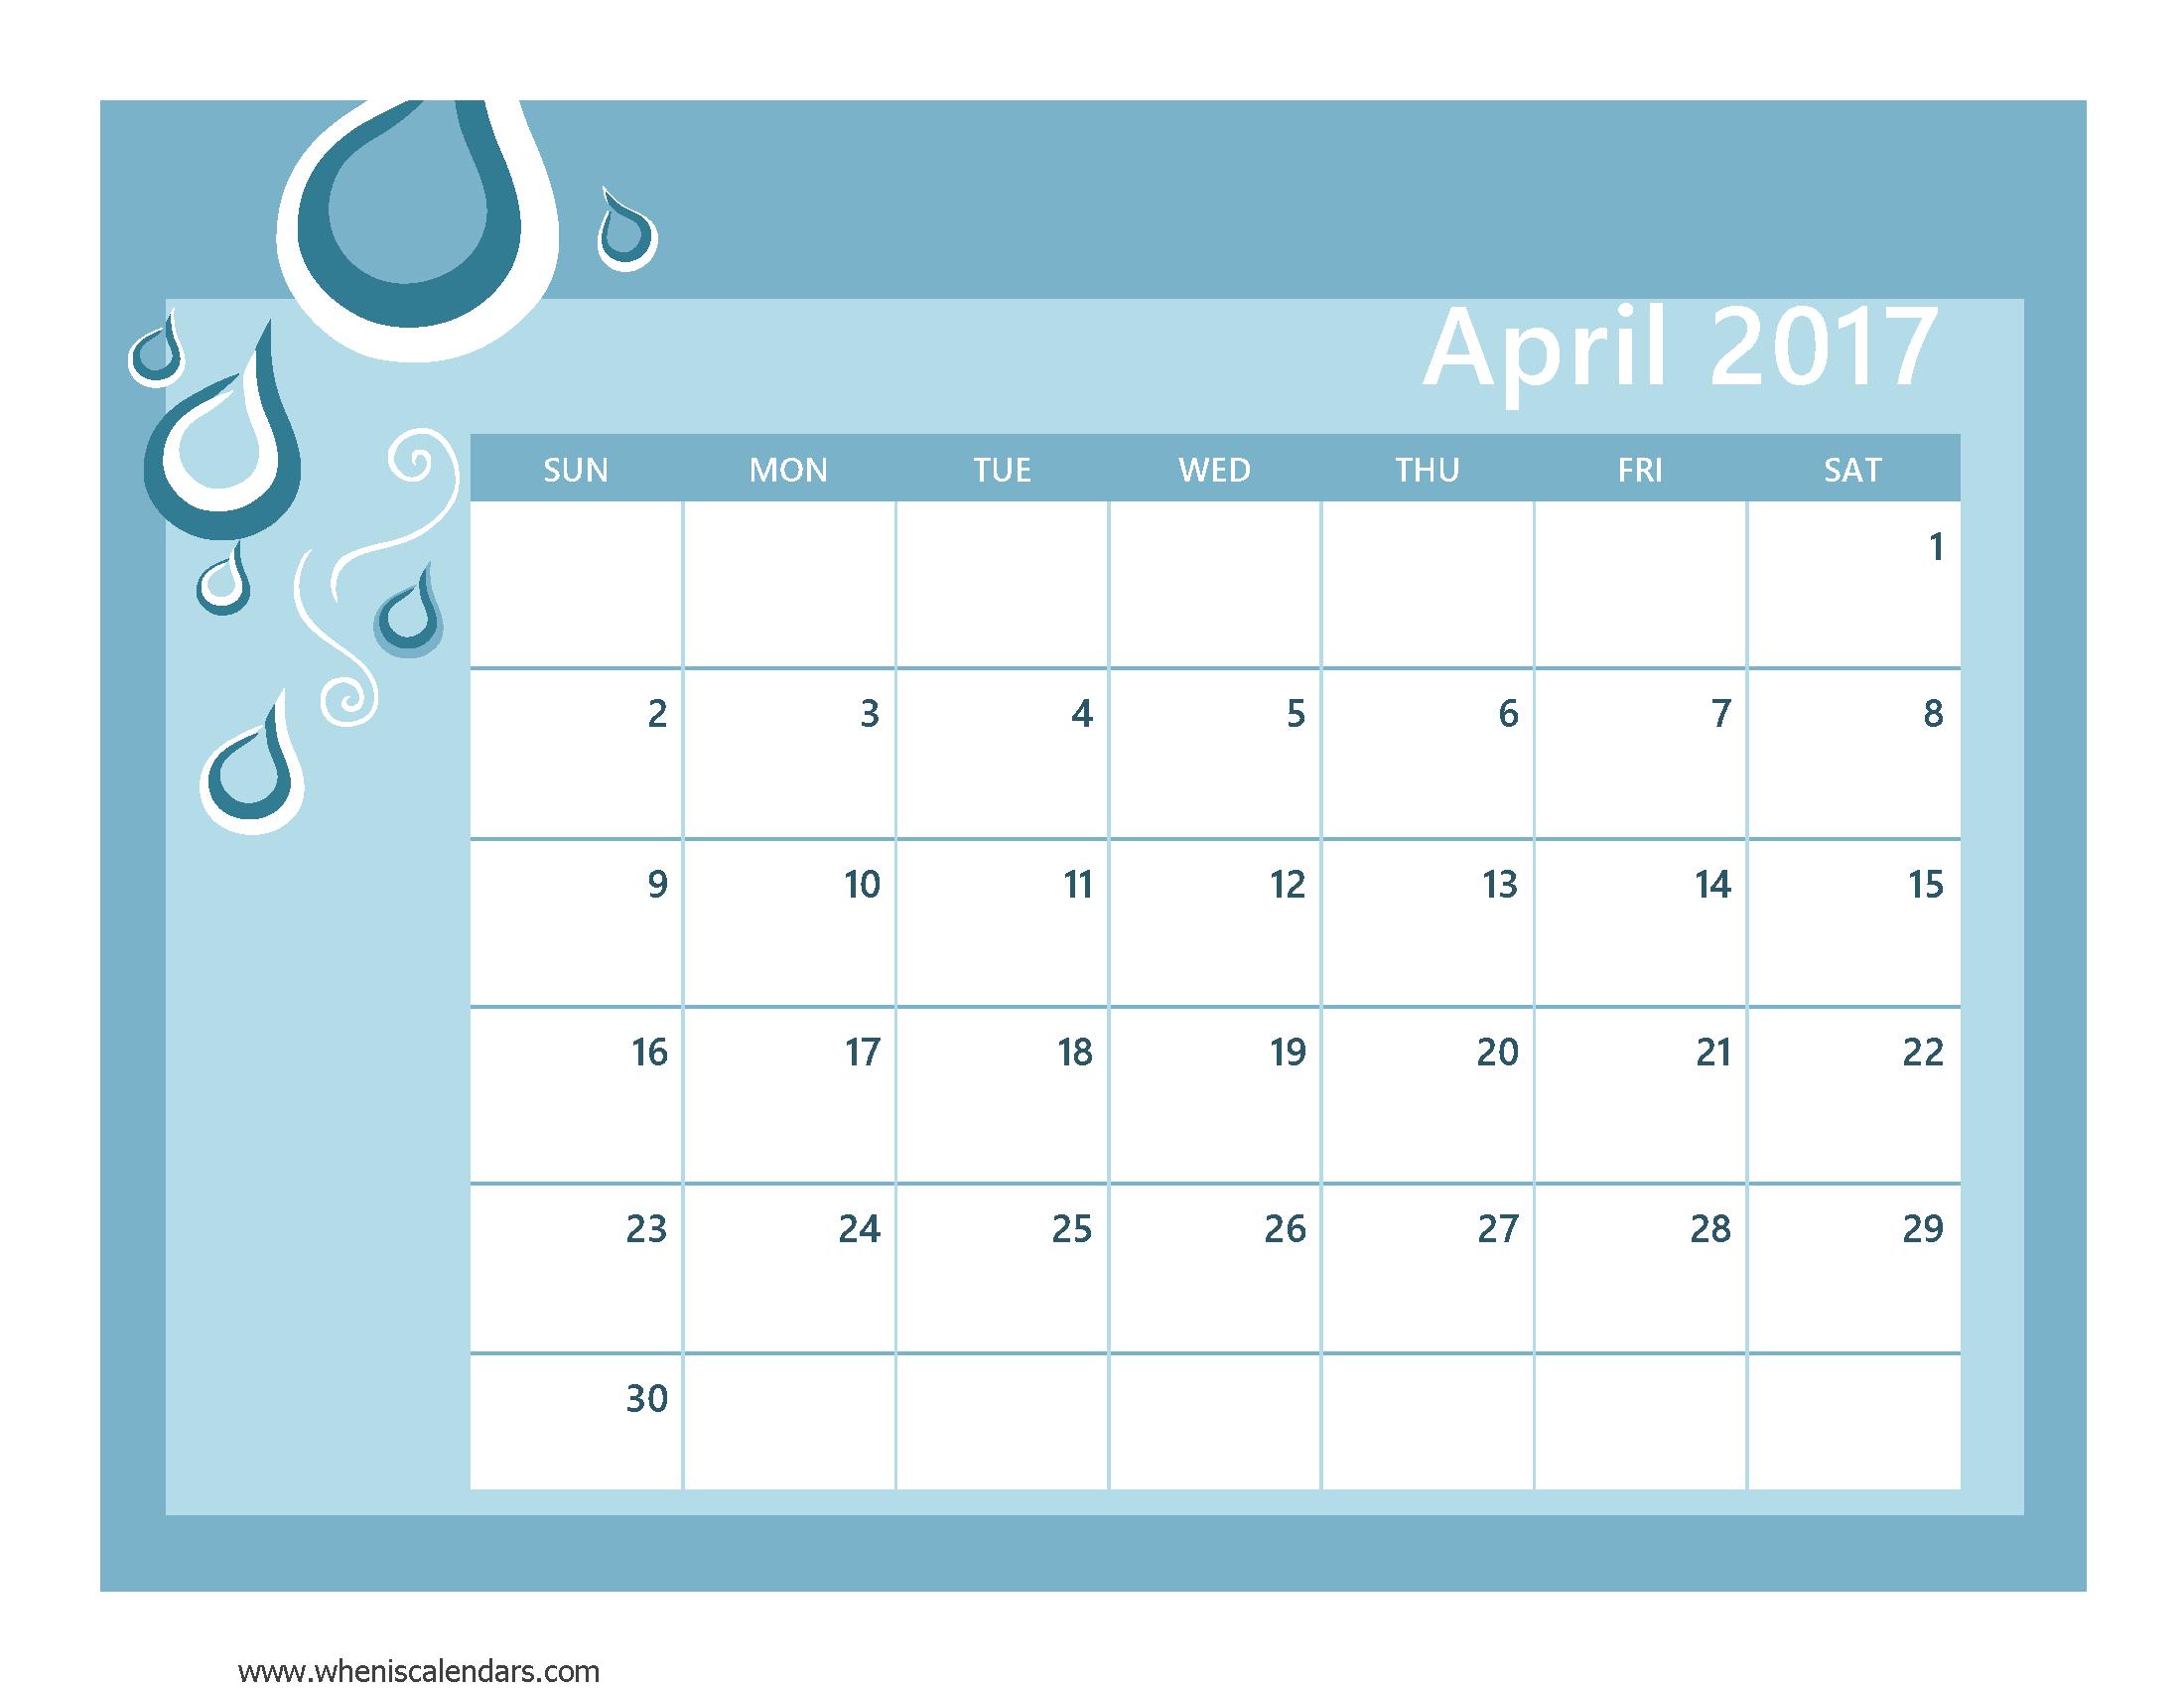 April 2017 Calendar With US Holidays